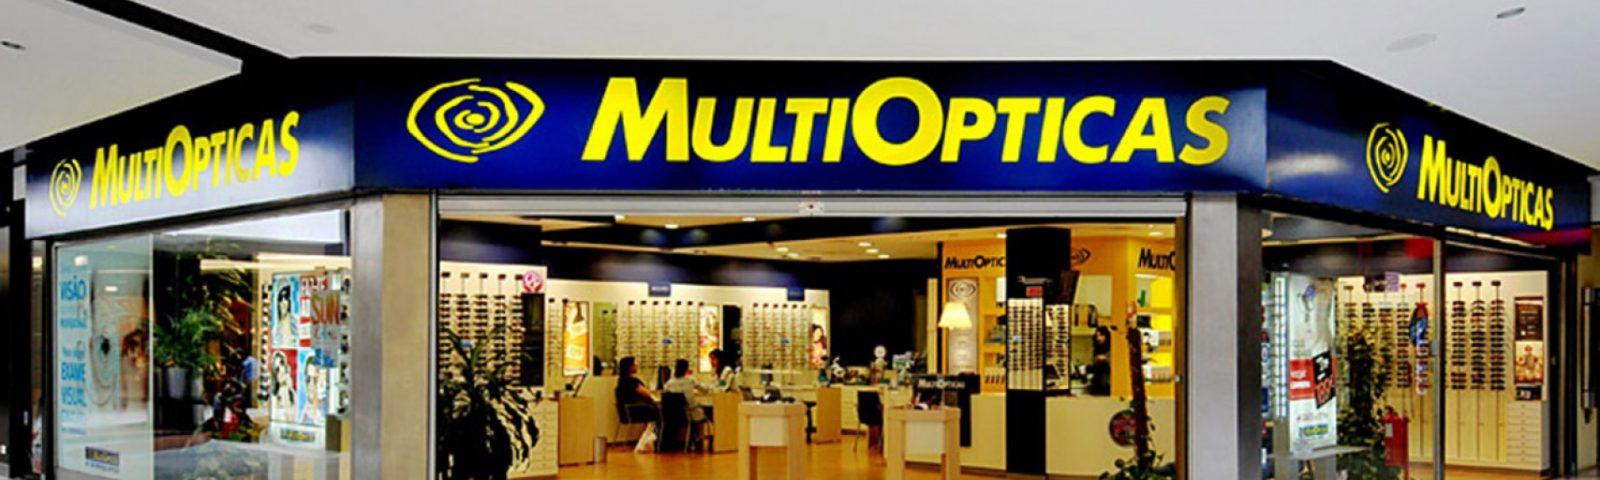 Multiopticas abre nova loja na Trofa